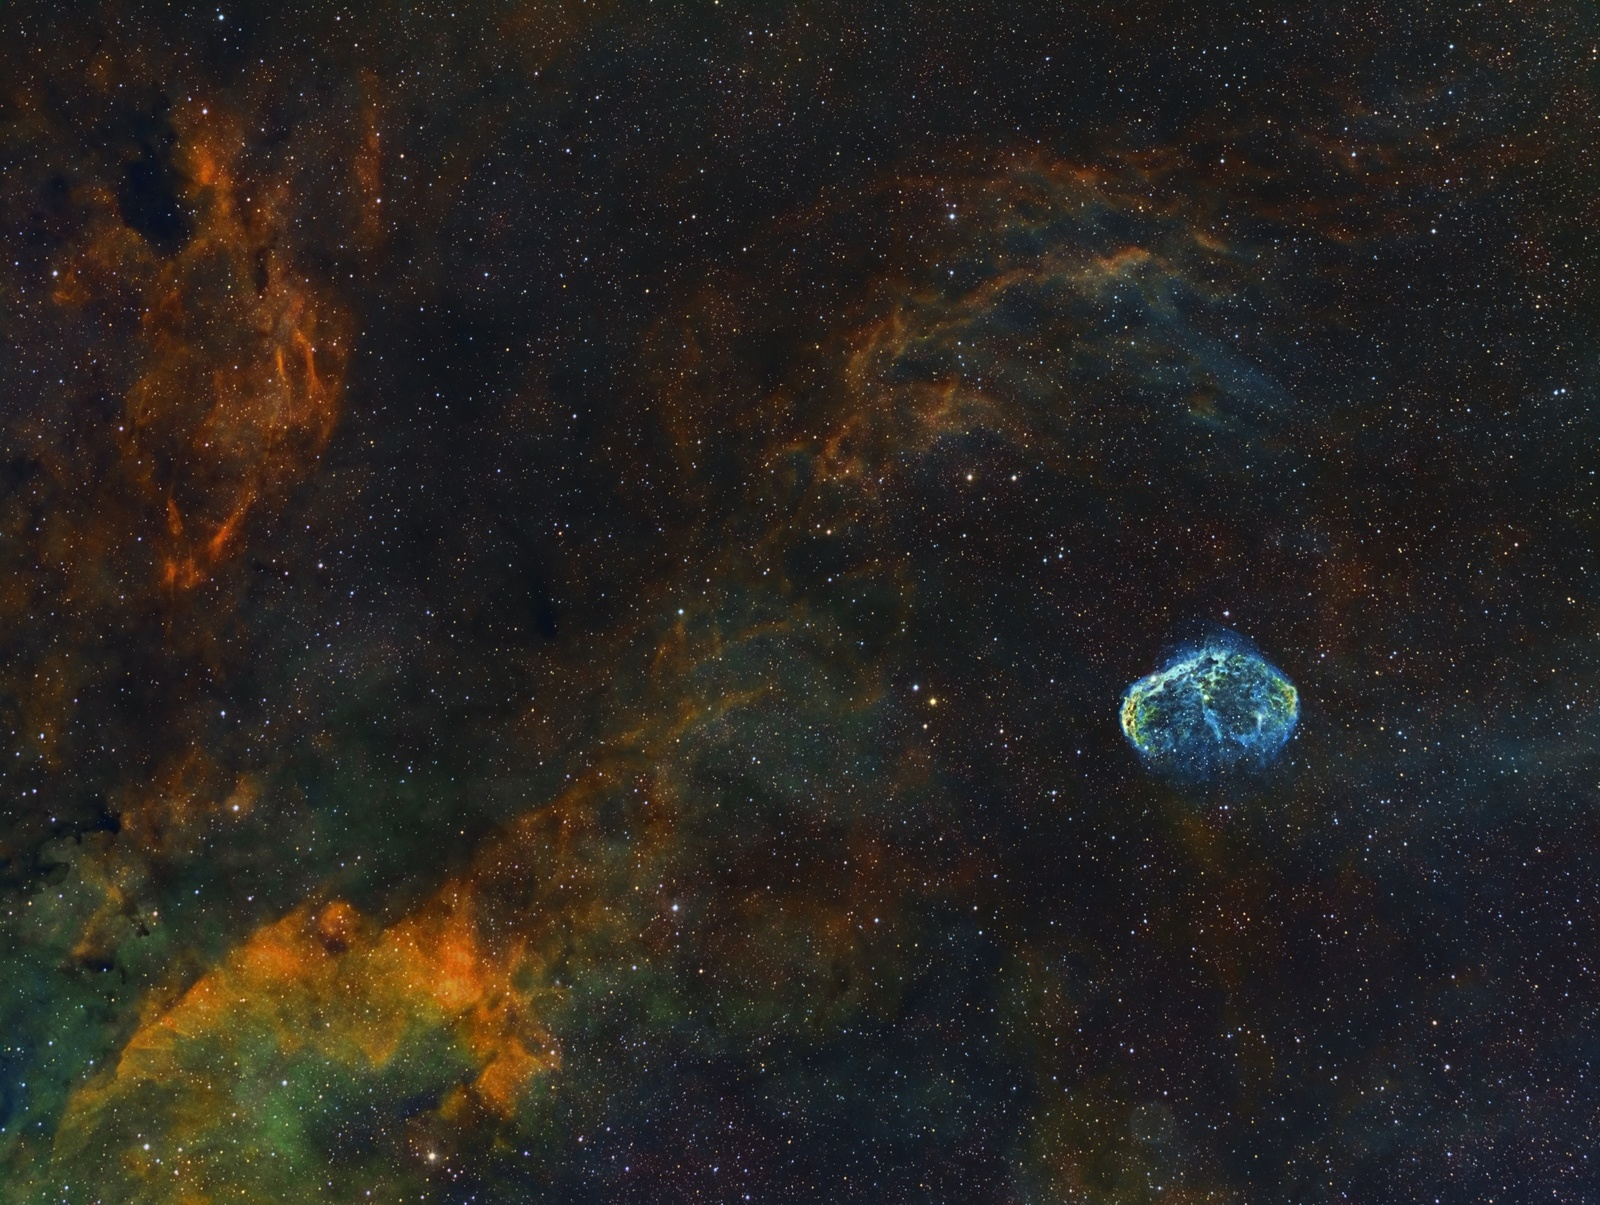 NGC6888.thumb.jpg.270a8f535b6f5d9e0cda49a019c008f3.jpg